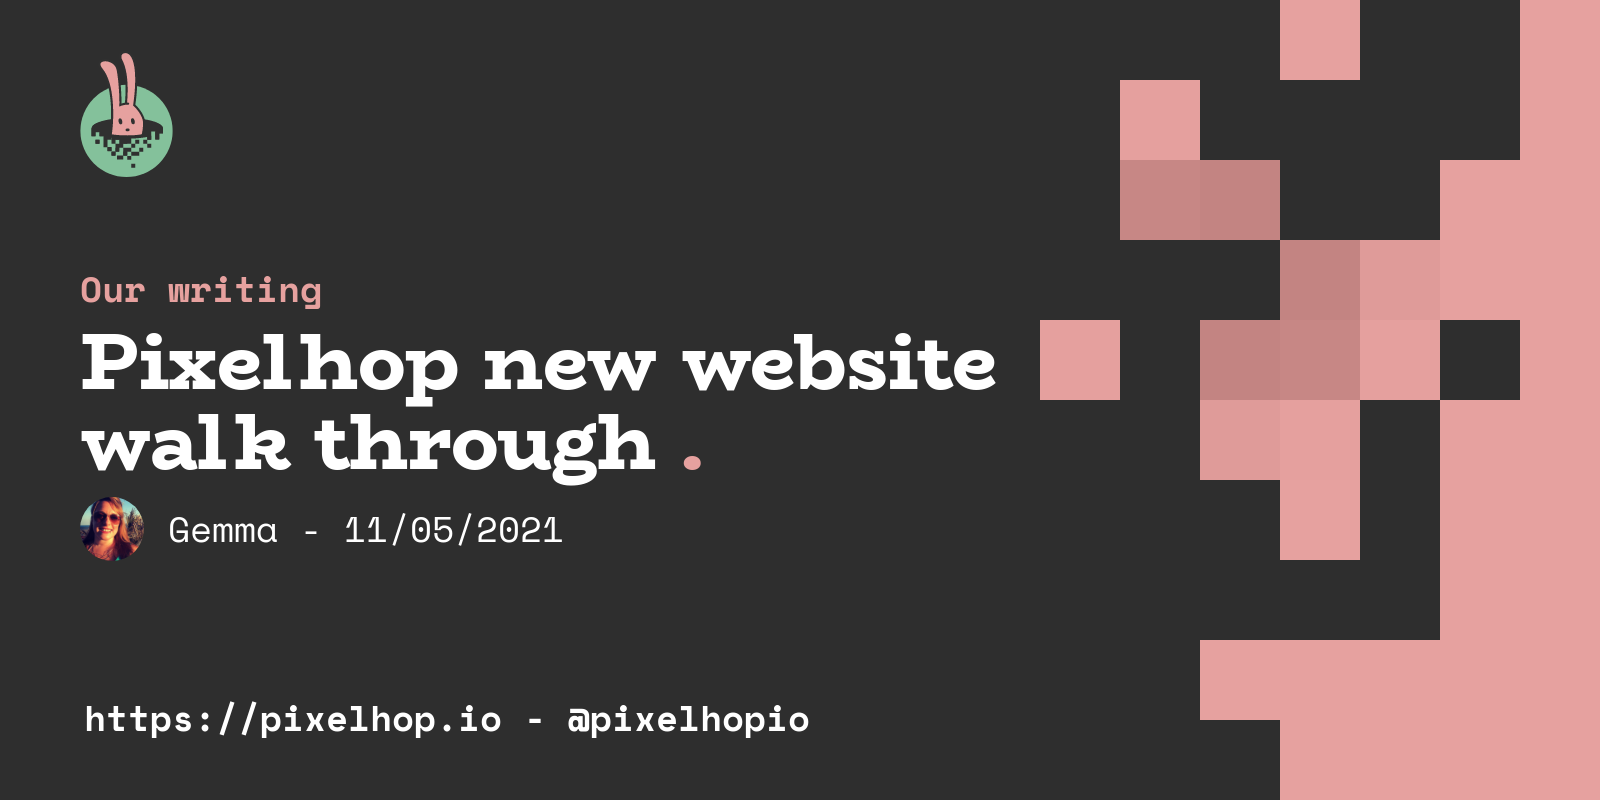 Pixelhop new website walk through